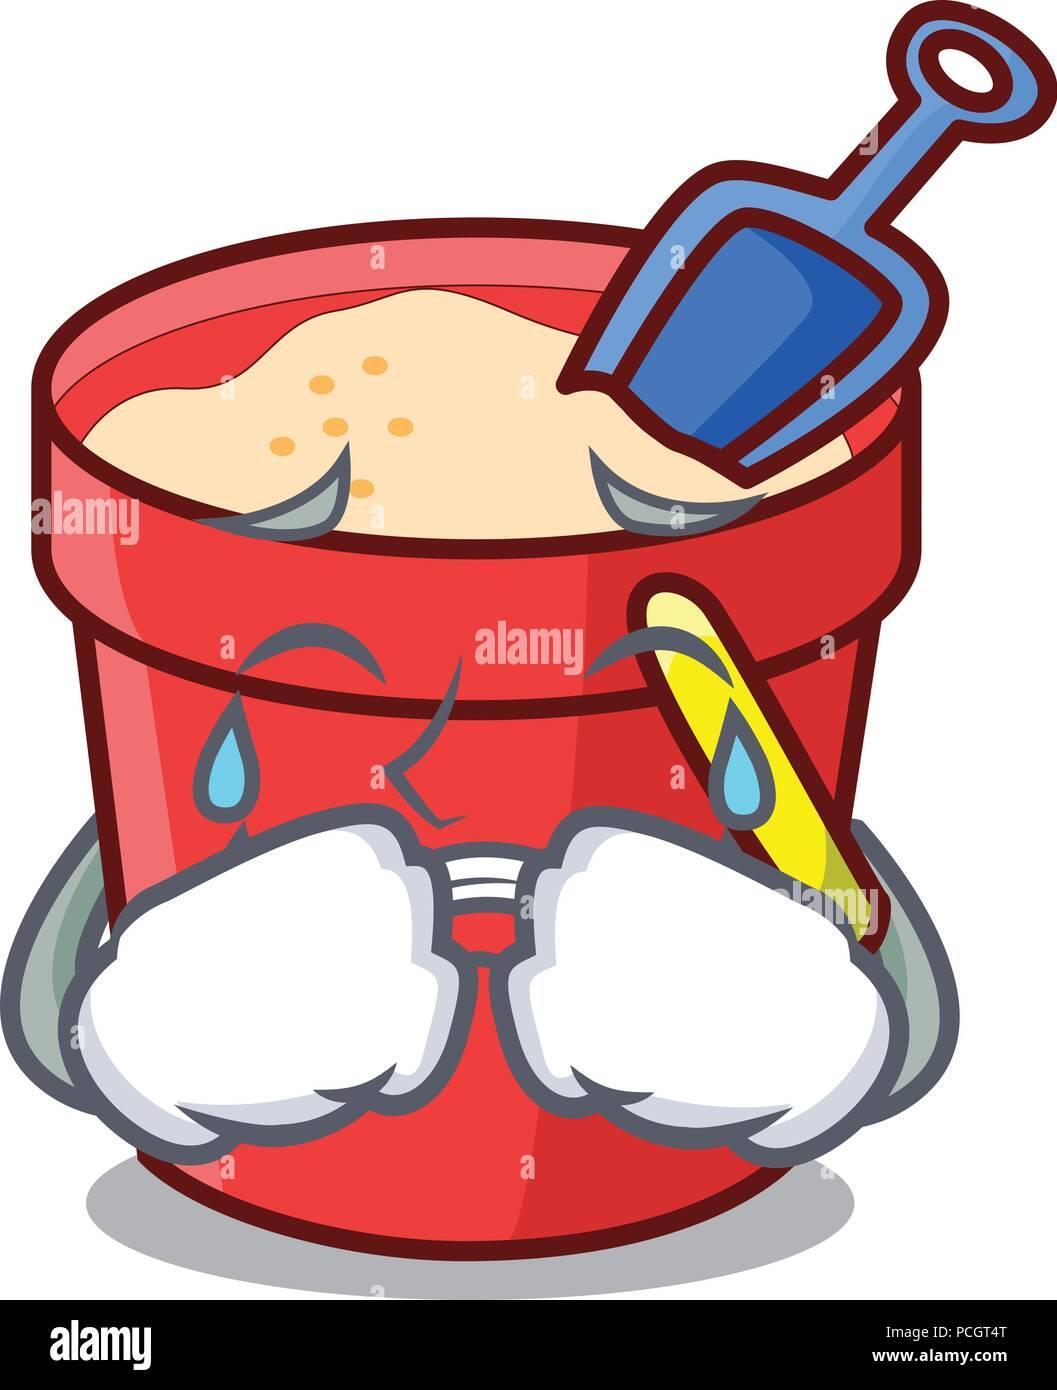 Crying sand bucket mascot cartoon - Stock Vector